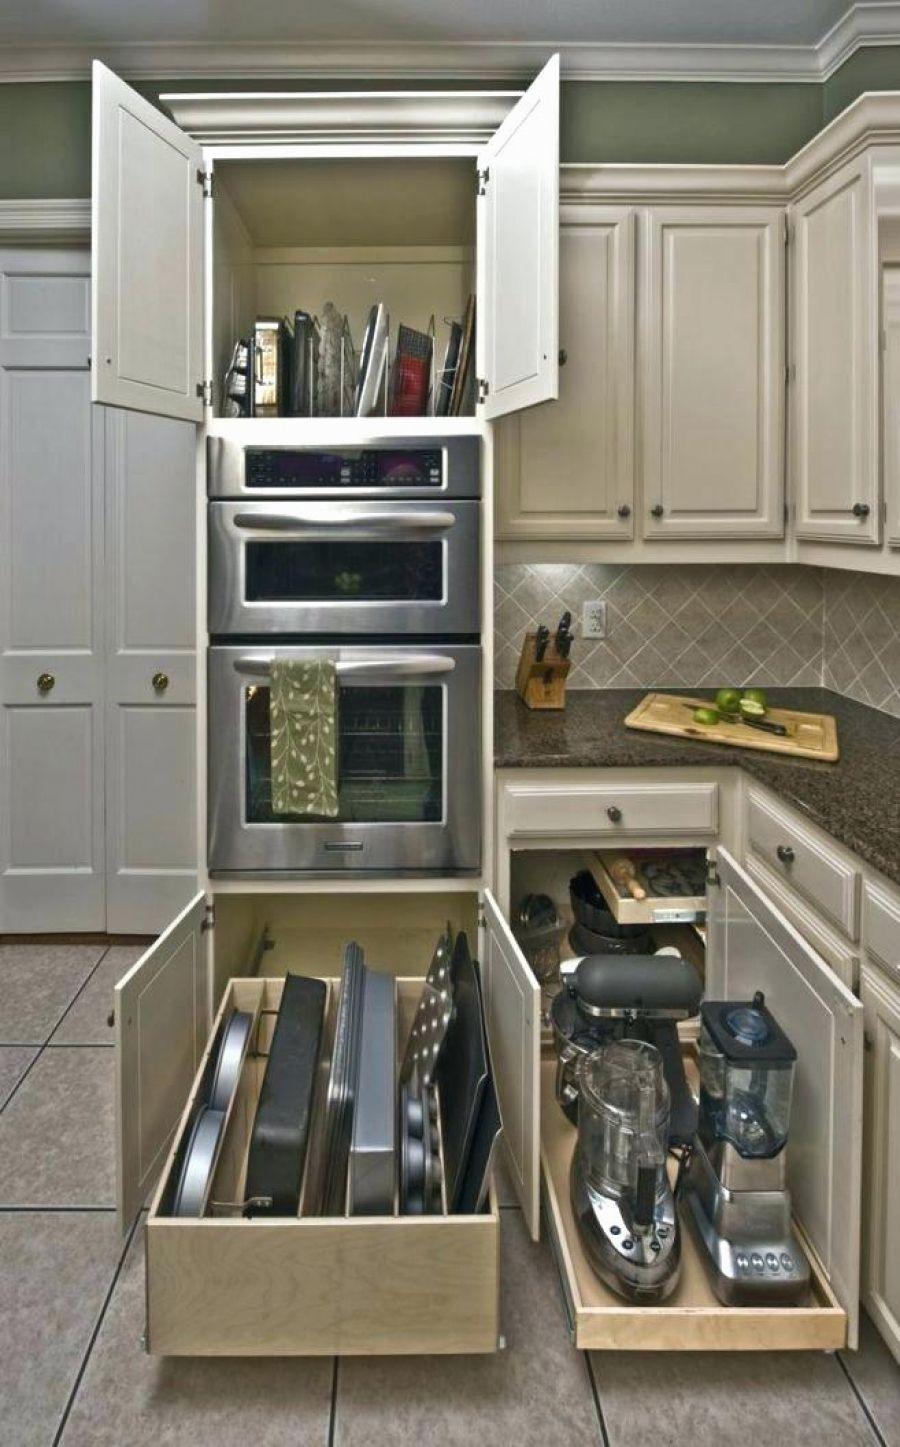 5 Original Creative Hidden Kitchen Storage Solutions With Images